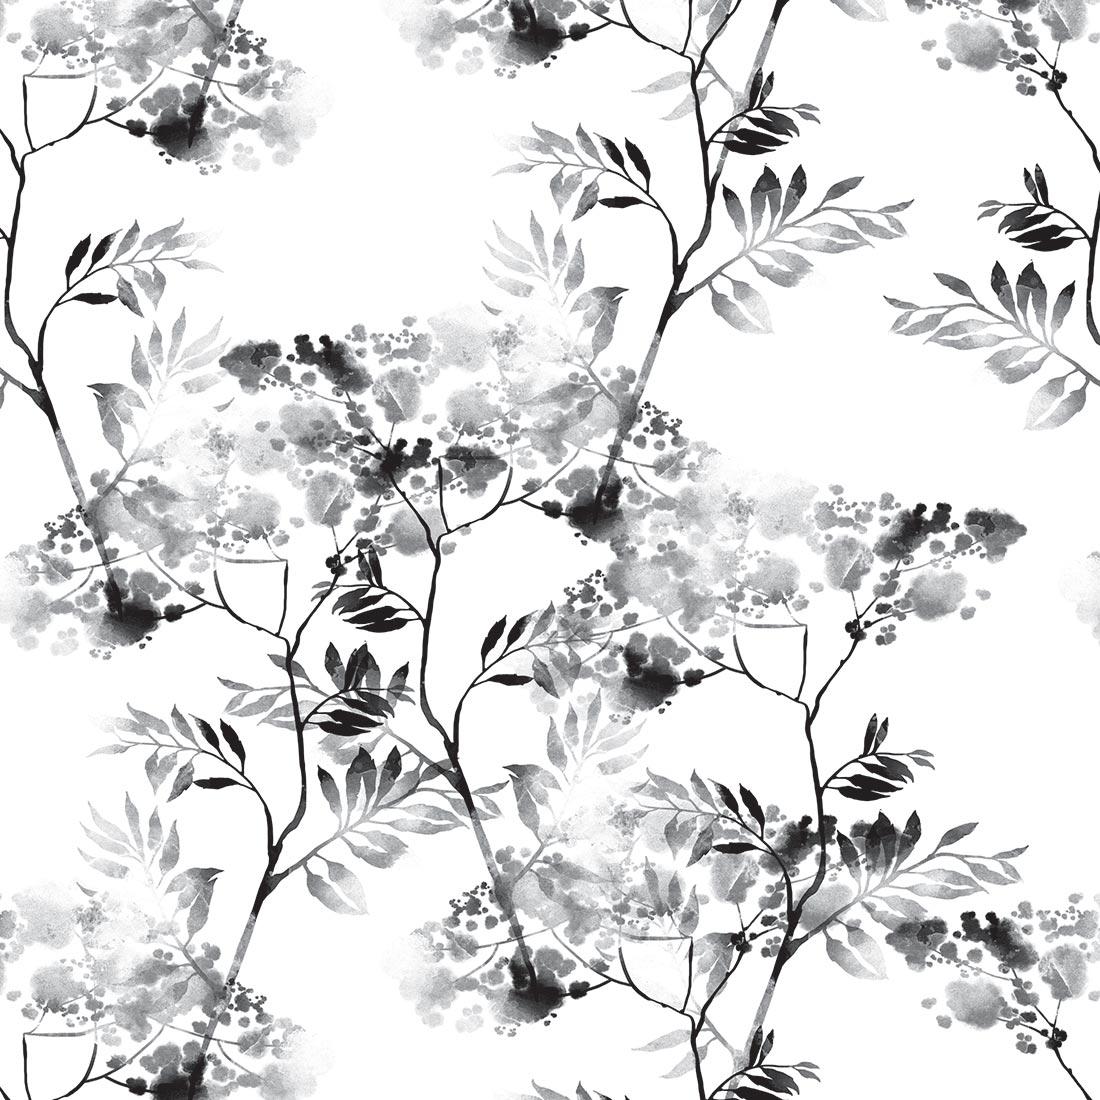 Papel de Parede Floral Desenhado Preto